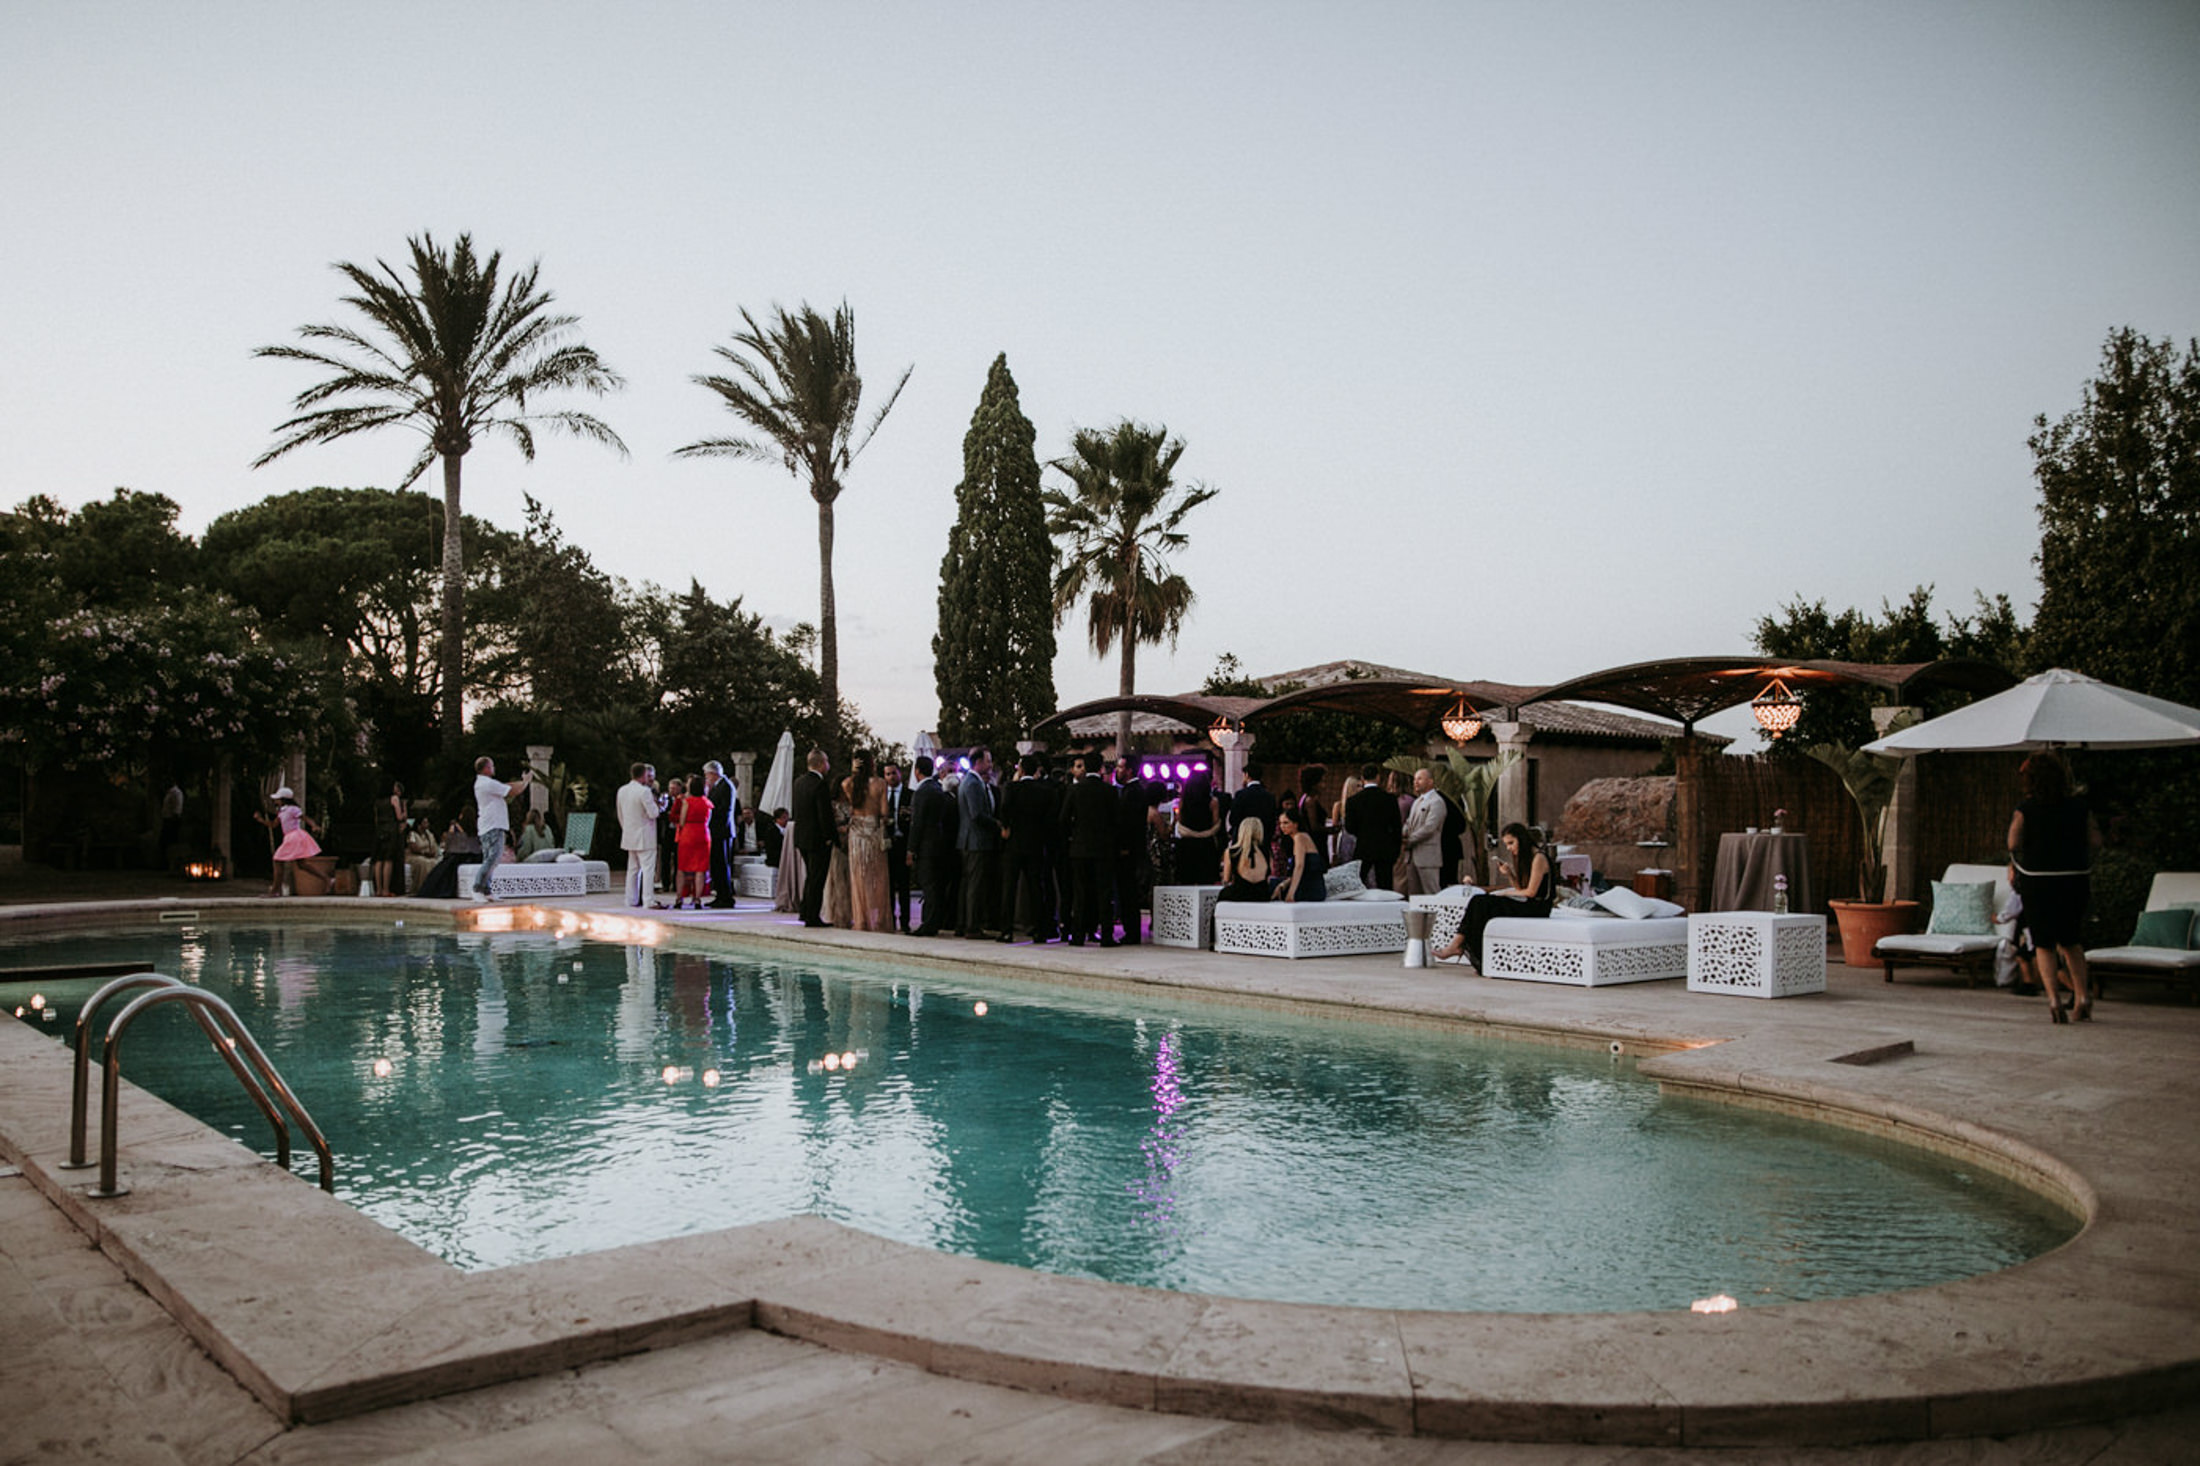 Wedding_Photographer_Mallorca_Daniela-Marquardt_Photography_New_York_Iceland_Tuscany_Santorini_Portugal_Austria_Bavaria_Elopement_Hochzeitsfotograf_AntjeRajat2_105